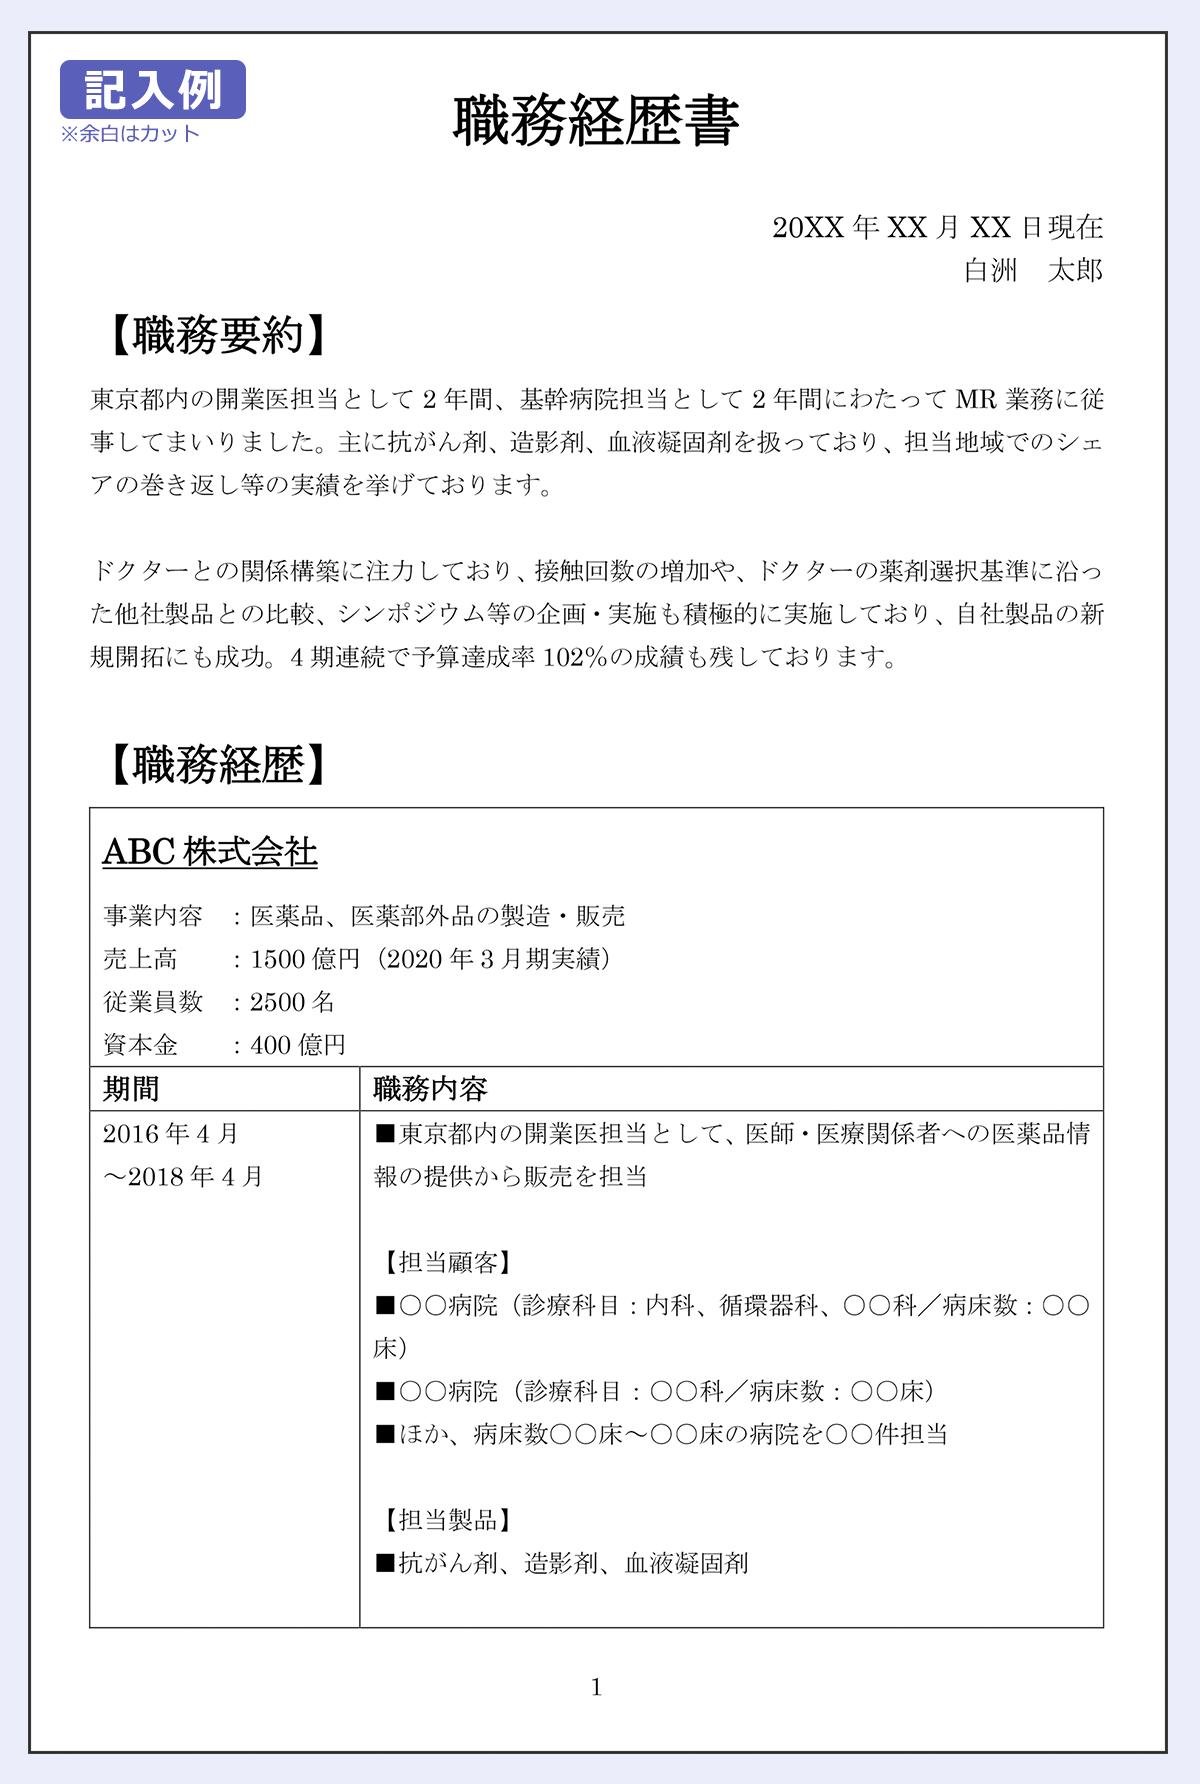 MRの職務経歴書の記入例(1ページめ) 日付:20XX年XX月XX日現在 氏名:白洲 太郎 【職務要約】 東京都内の開業医担当として2年間、基幹病院担当として2年間にわたってMR業務に従事してまいりました。主に抗がん剤、造影剤、血液凝固剤を扱っており、担当地域でのシェアの巻き返し等の実績を挙げております。 ドクターとの関係構築に注力しており、接触回数の増加や、ドクターの薬剤選択基準に沿った他社製品との比較、シンポジウム等の企画・実施も積極的に実施しており、自社製品の新規開拓にも成功。4期連続で予算達成率102%の成績も残しております。 【職務経歴】 ABC株式会社 |事業内容:医薬品、医薬部外品の製造・販売 |売上高:1500億円(2020年3月期実績) |従業員数:2500名 |資本金:400億円 (期間/職務内容) 2016年4月~2018年4月/■東京都内の開業医担当として、医師・医療関係者への医薬品情報の提供から販売を担当 【担当顧客】 ■○○病院(診療科目:内科、循環器科、○○科/病床数:○○床) ■○○病院(診療科目:○○科/病床数:○○床) ■ほか、病床数○○床~○○床の病院を○○件担当 【担当製品】 ■抗がん剤、造影剤、血液凝固剤 【実績】 ・2016年度(予算達成率:102%、売上高:○○○○万円) ・2017年度(予算達成率:102%、売上高:○○○○万円)